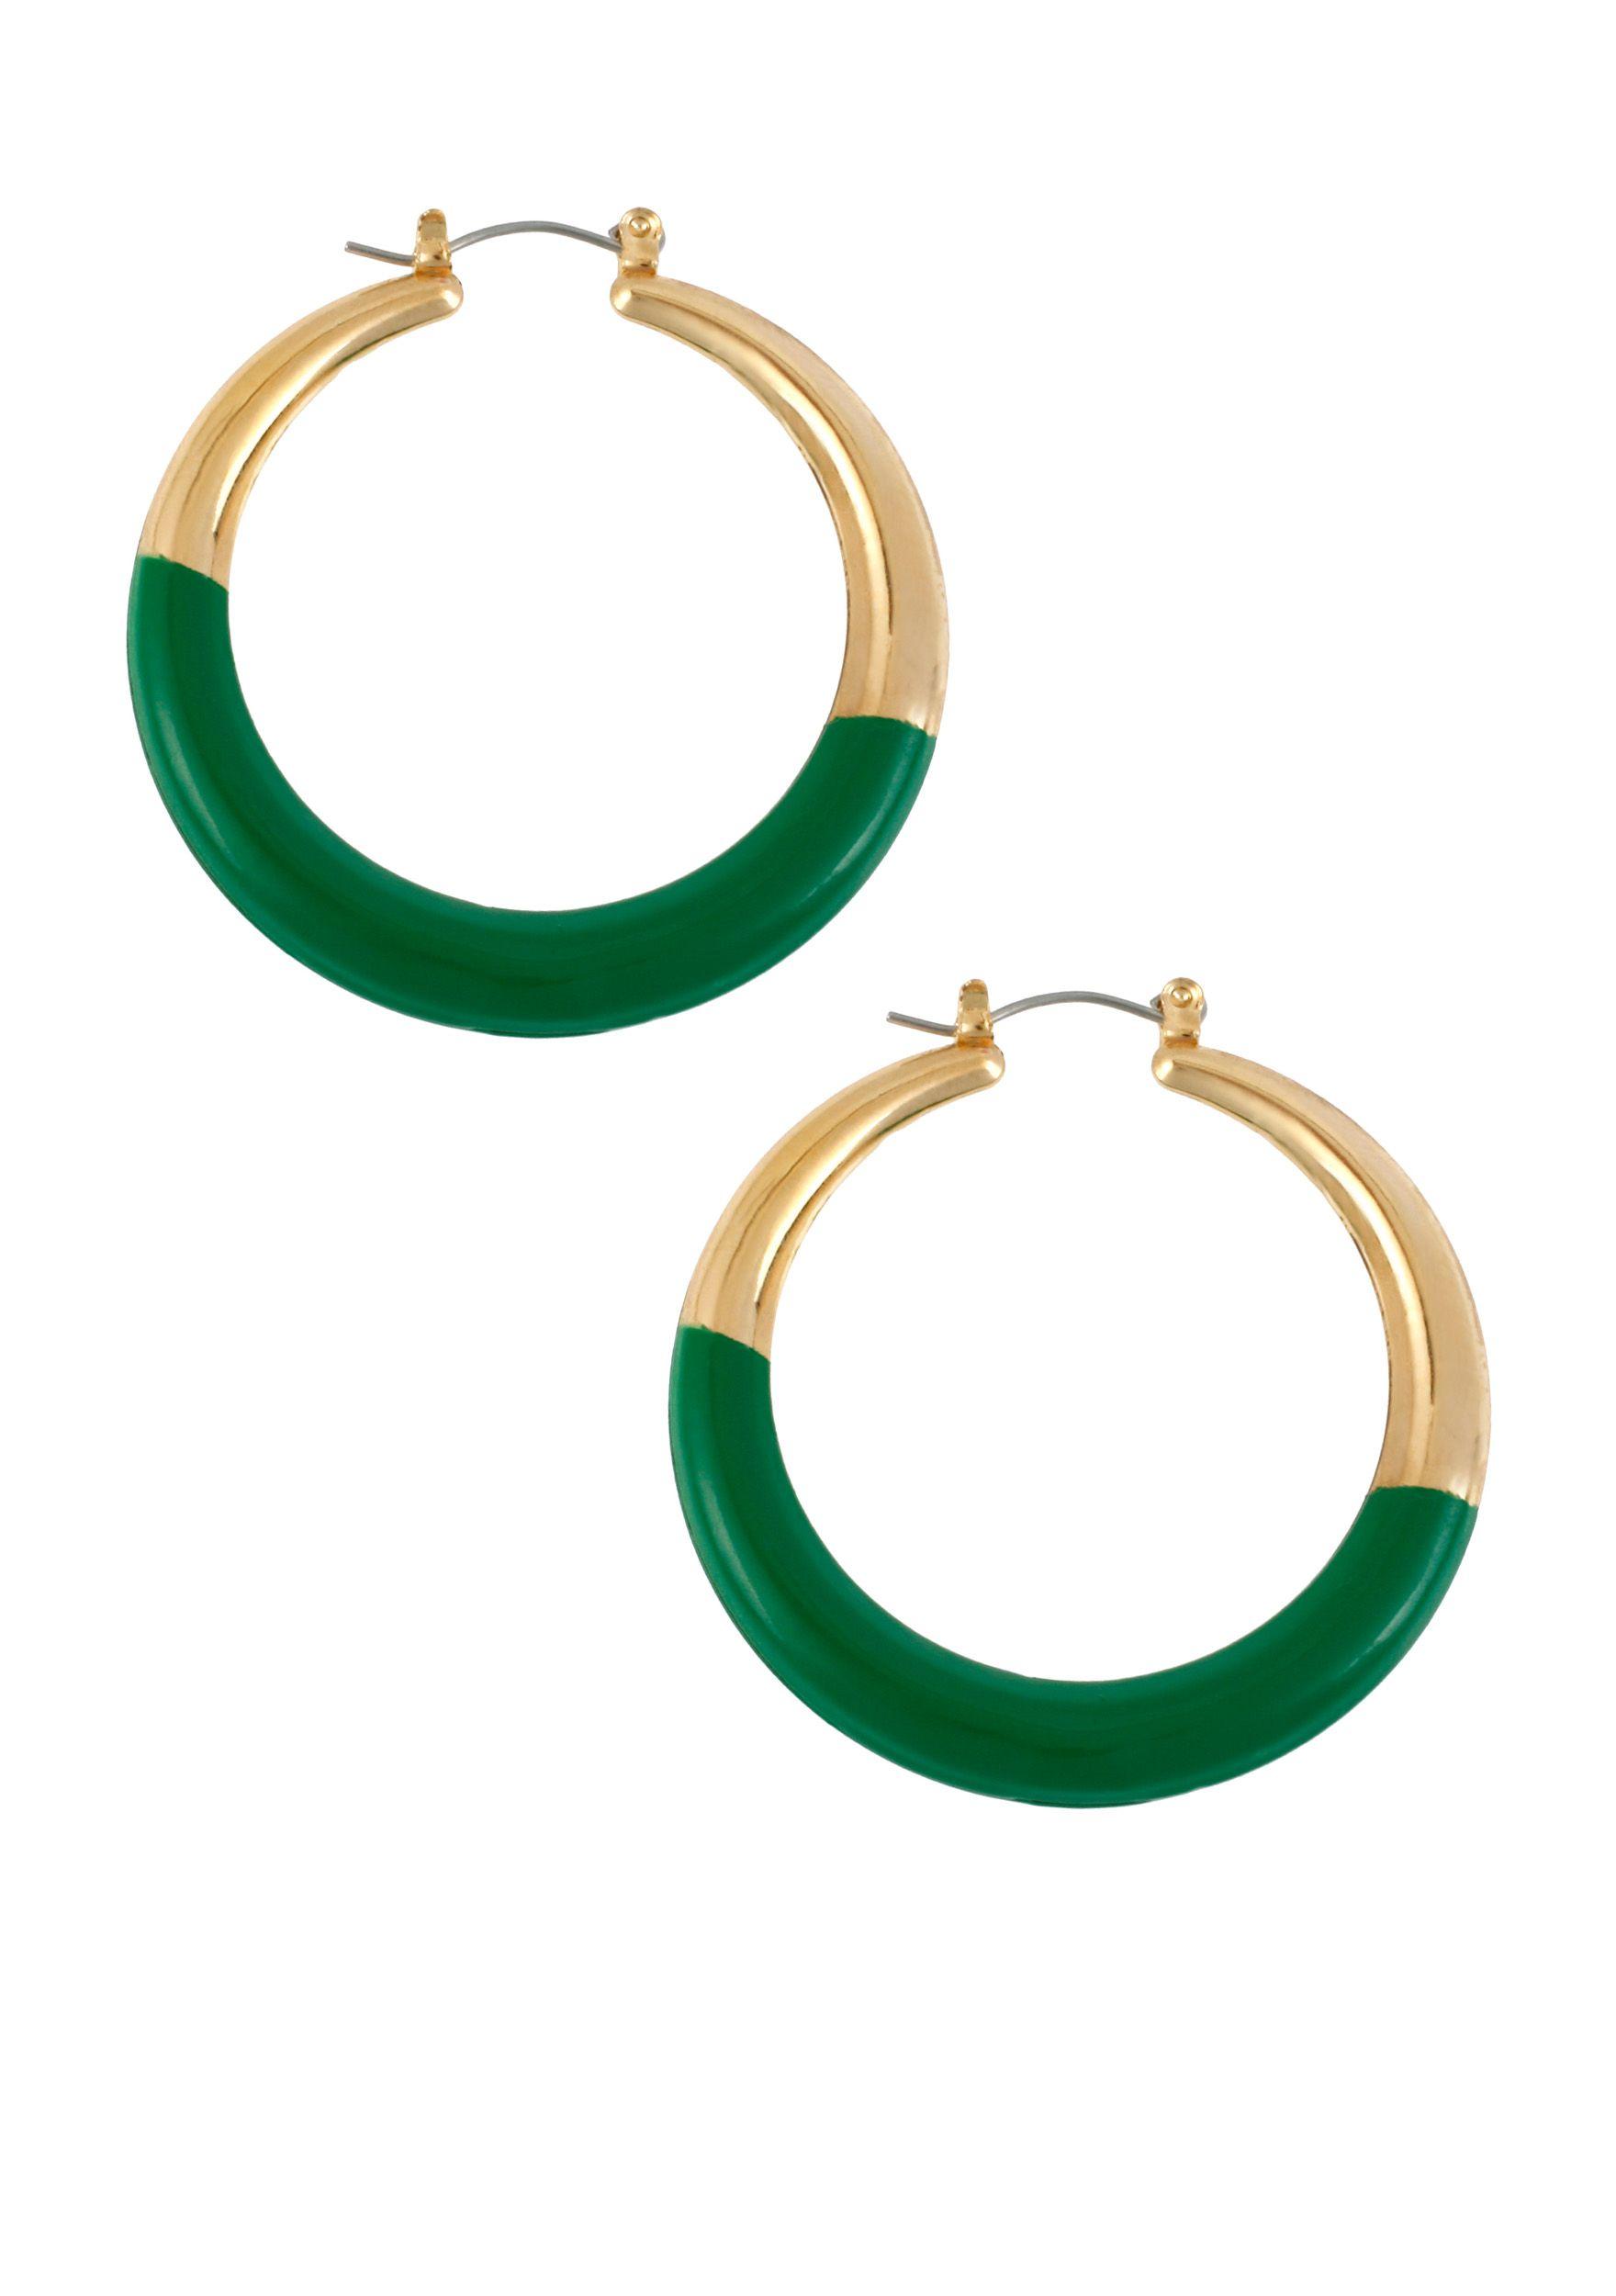 Cynthia Rowley Green And Gold Hoop Earring Cynthiacynthiarowleyexclusively Belk Belkxunc